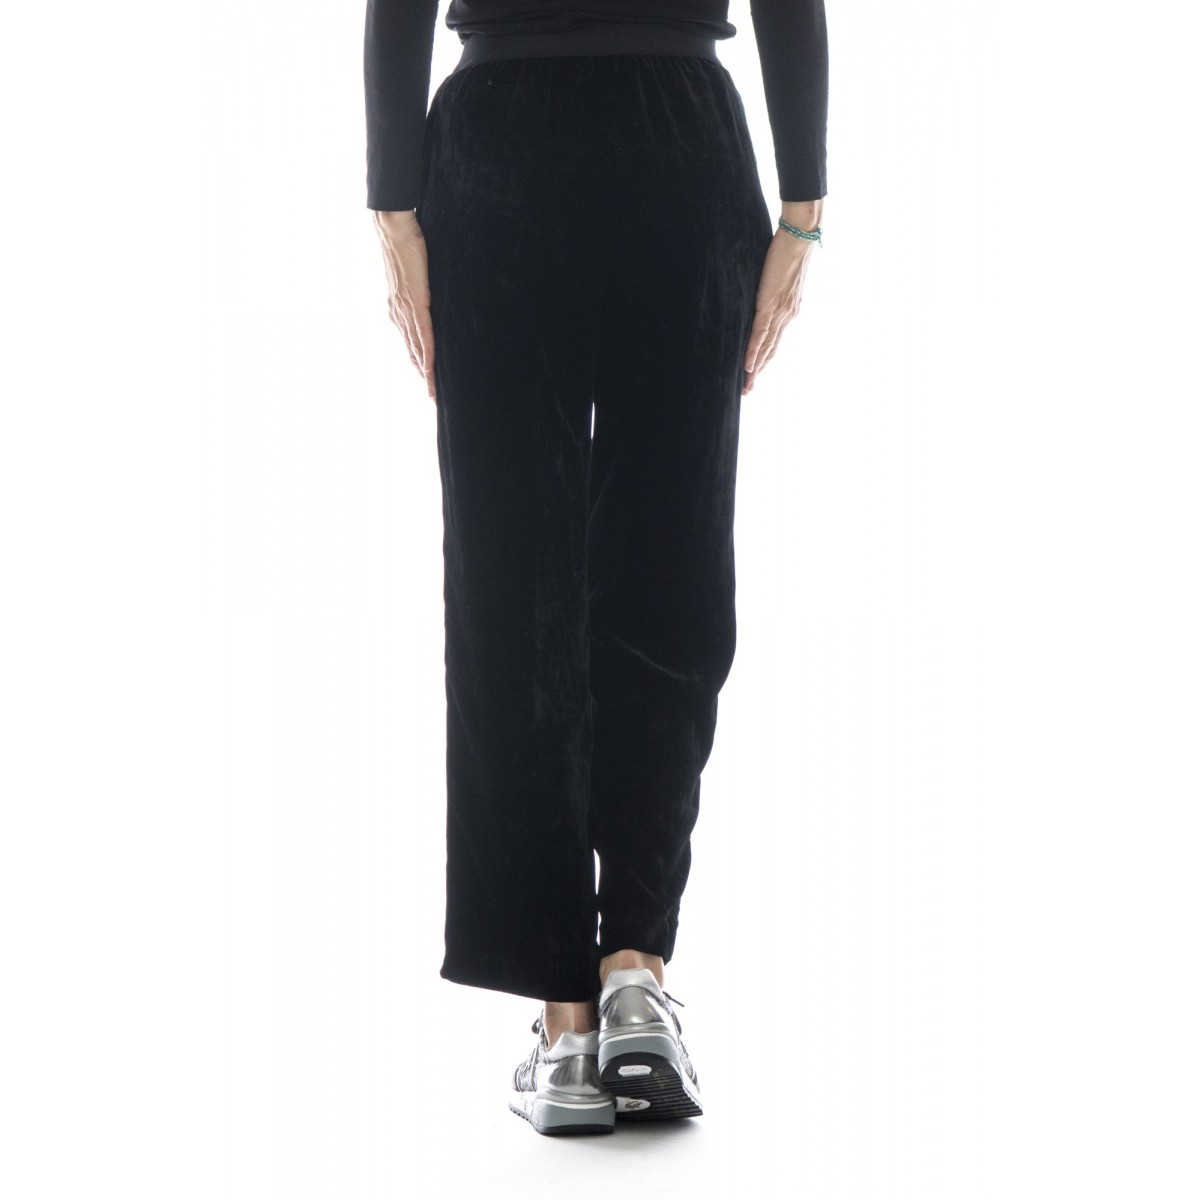 Pantalone donna - J4025 pantalone velluto